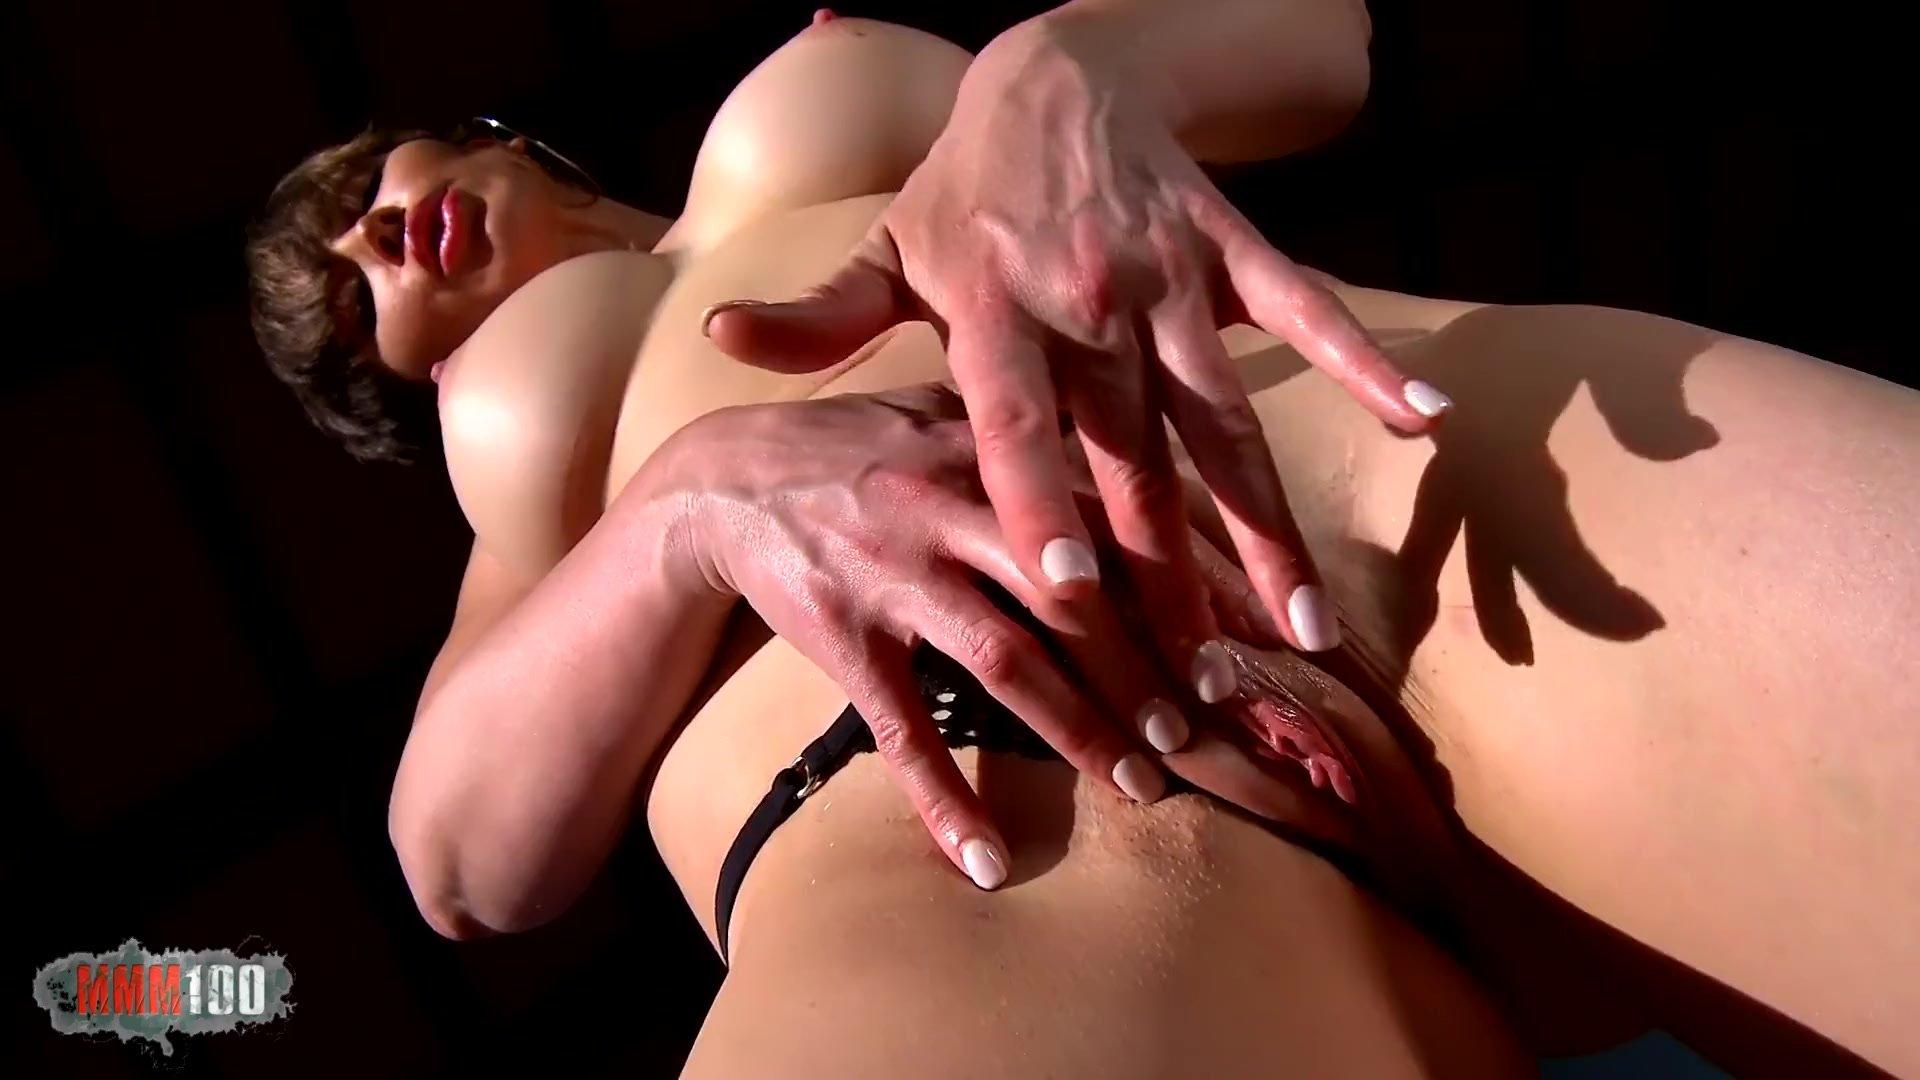 Mmm100/australian milf/sofa removing the scott tits